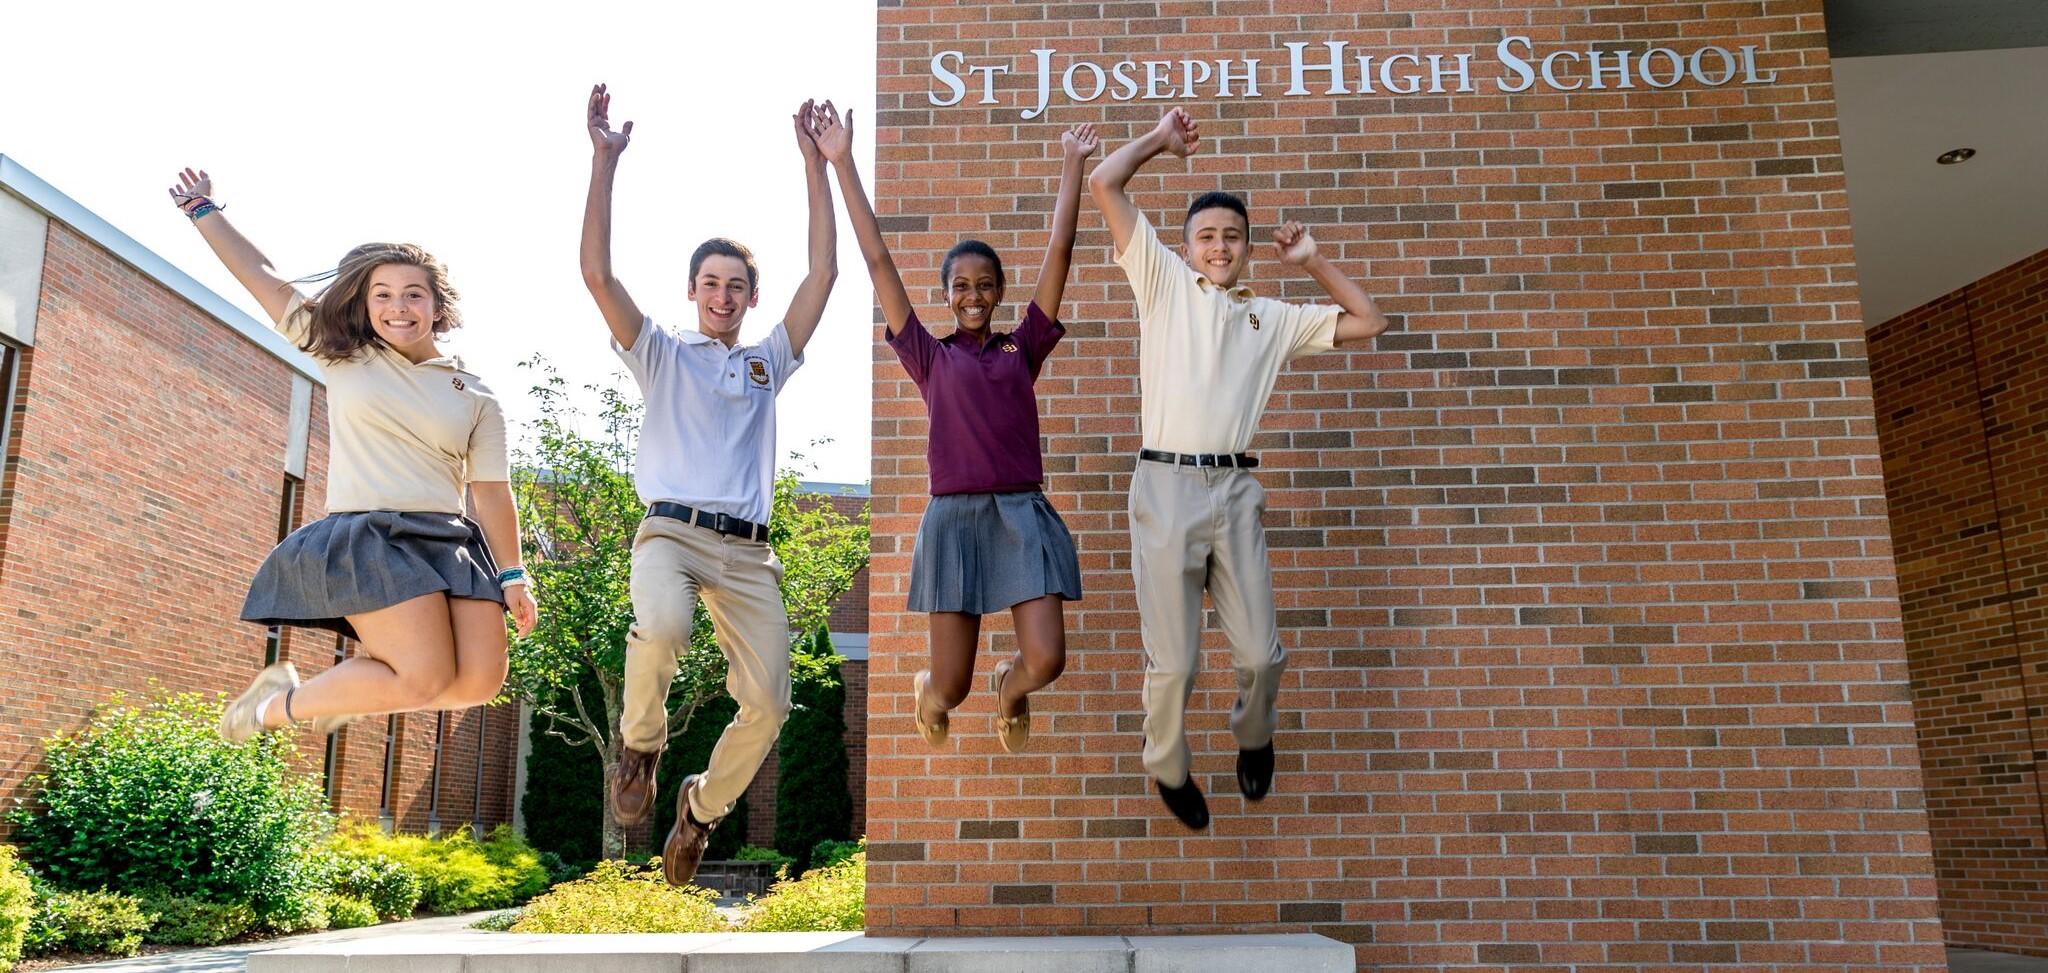 Connecticut - Trường Trung Học St. Joseph High School - USA